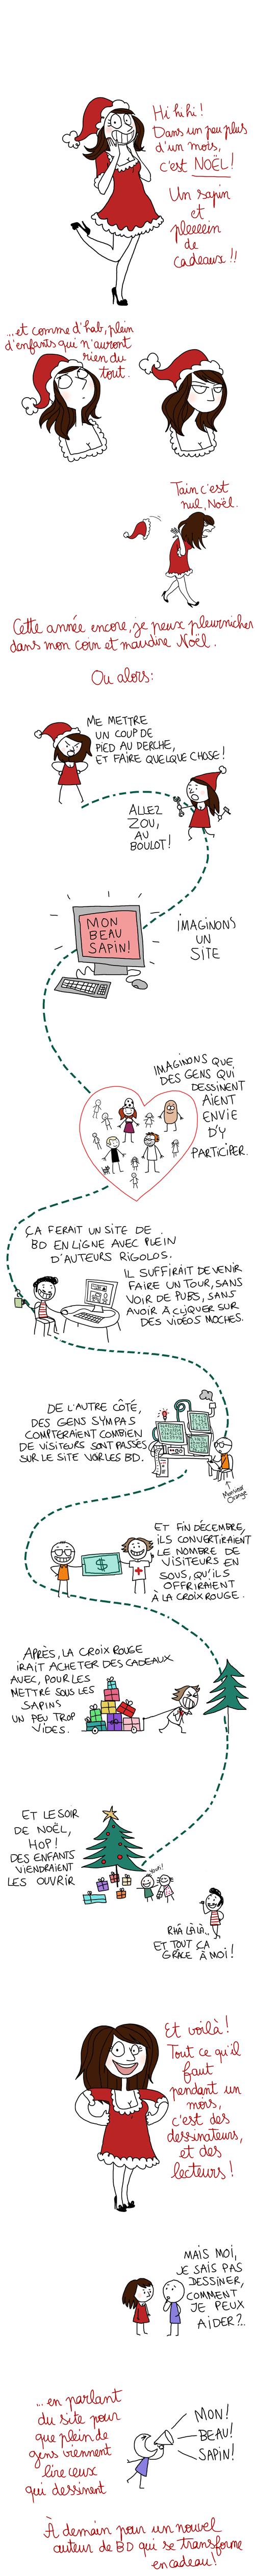 MON BEAU SAPIN dans DETENTE intro_2